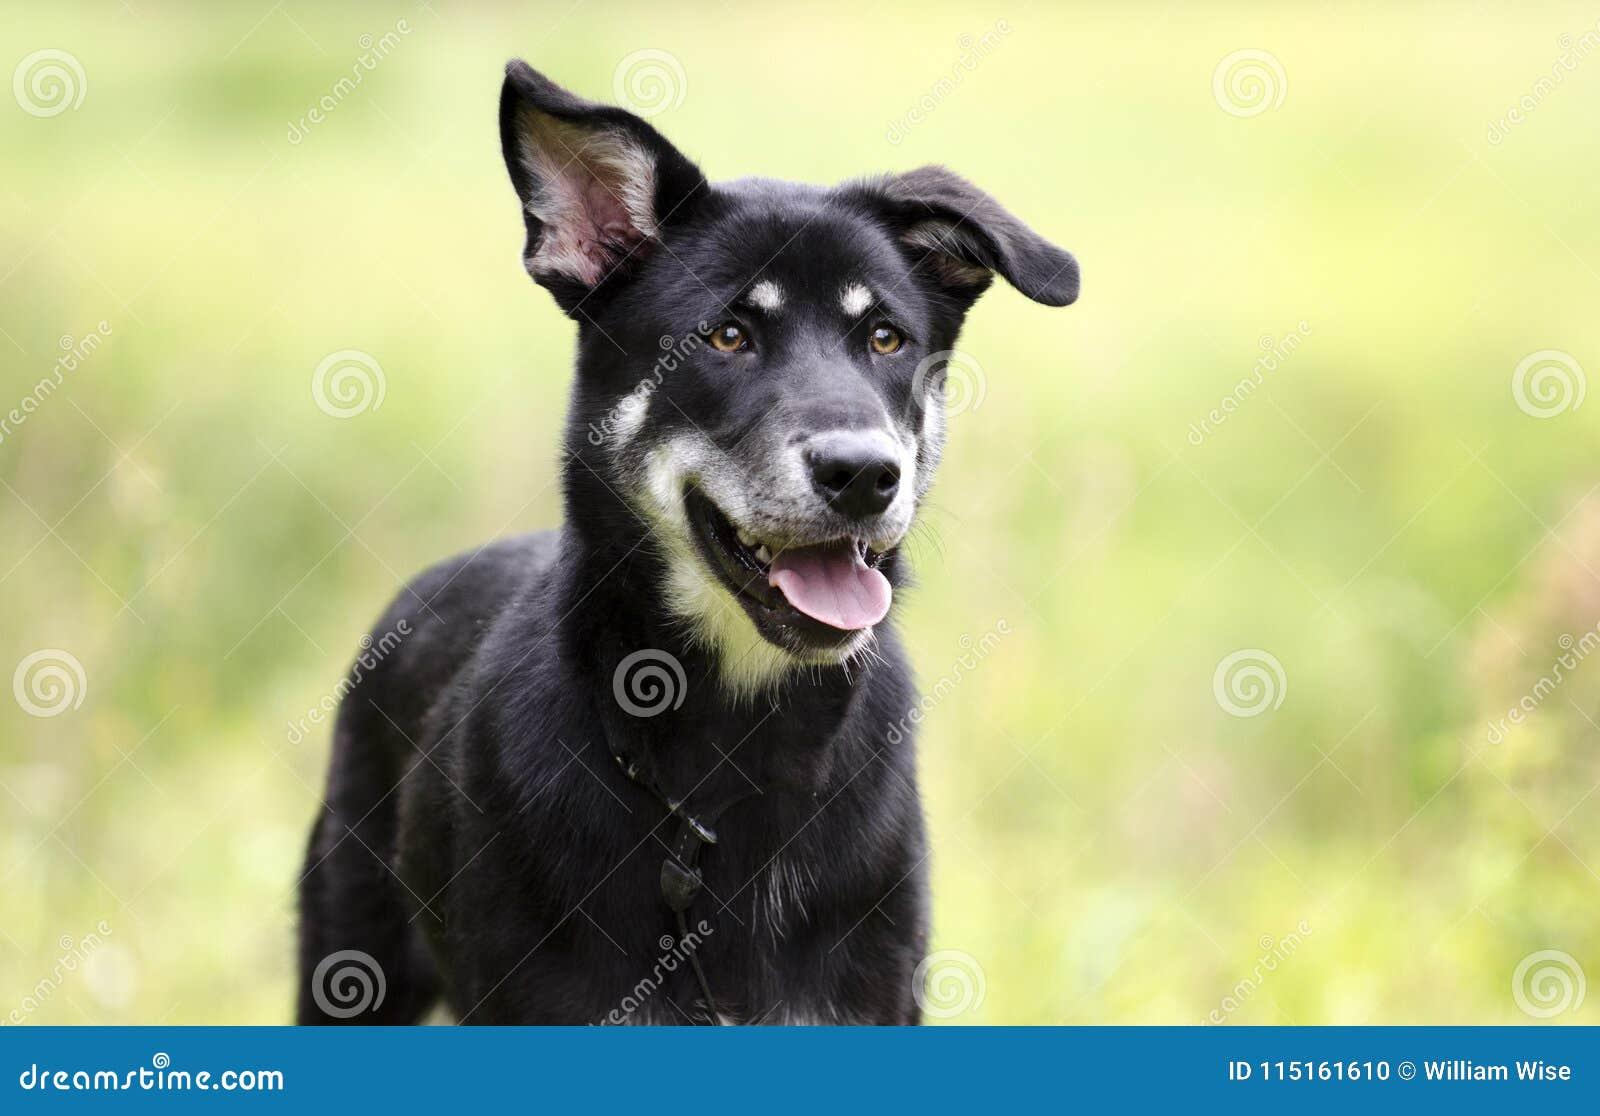 Happy Husky mix breed dog, pet rescue adoption photography